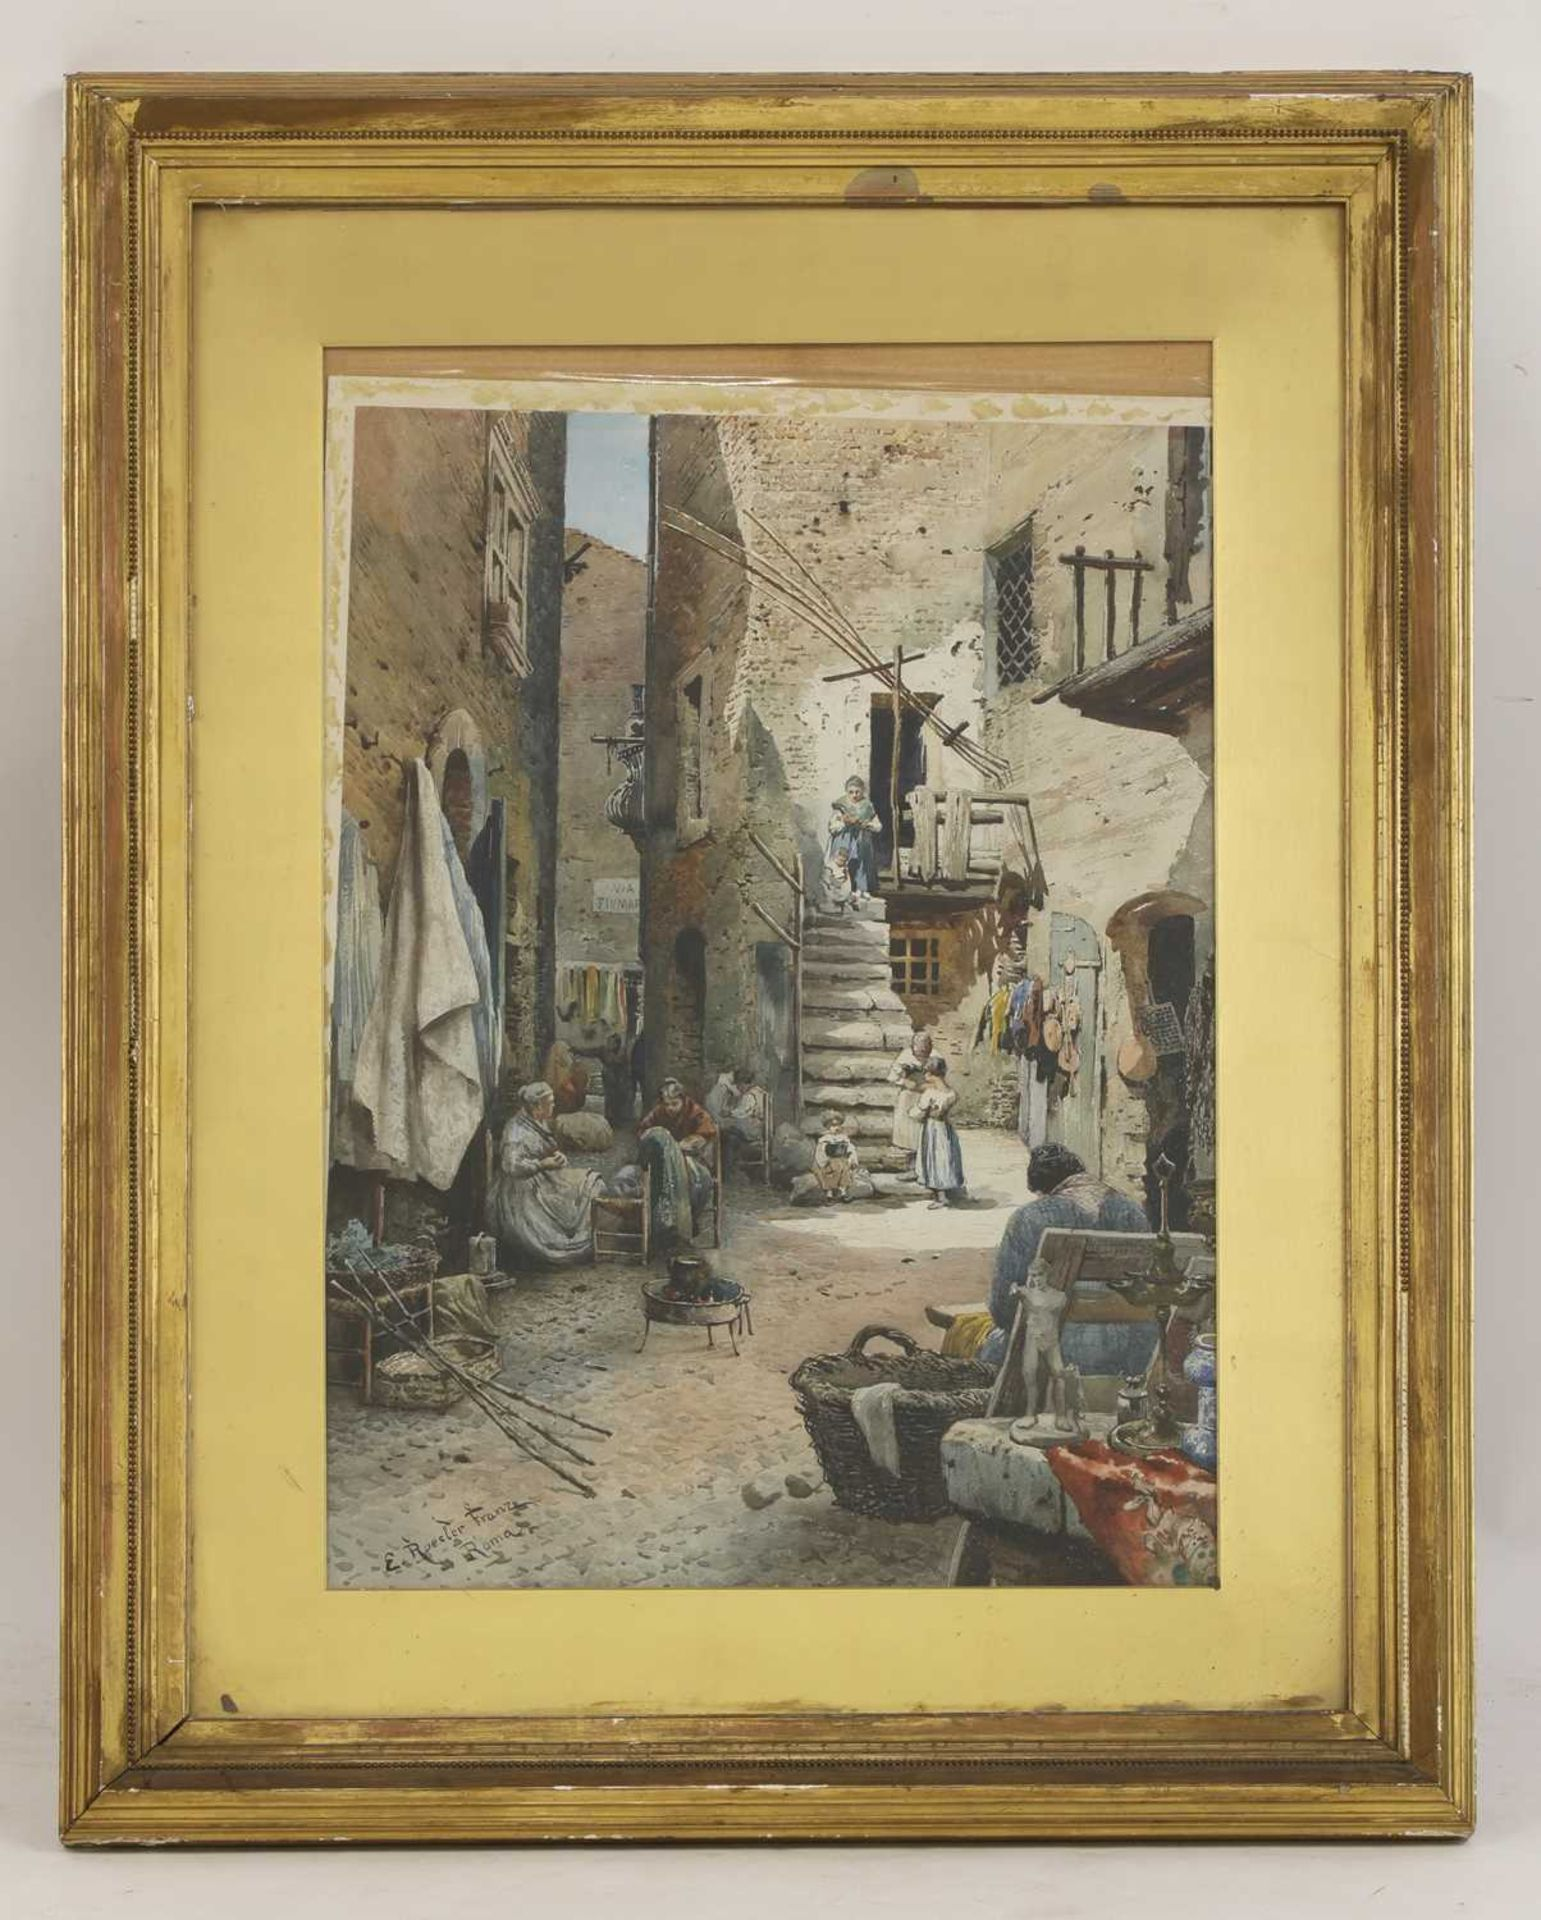 Ettore Roesler Franz (Italian, 1845-1907) - Image 10 of 10